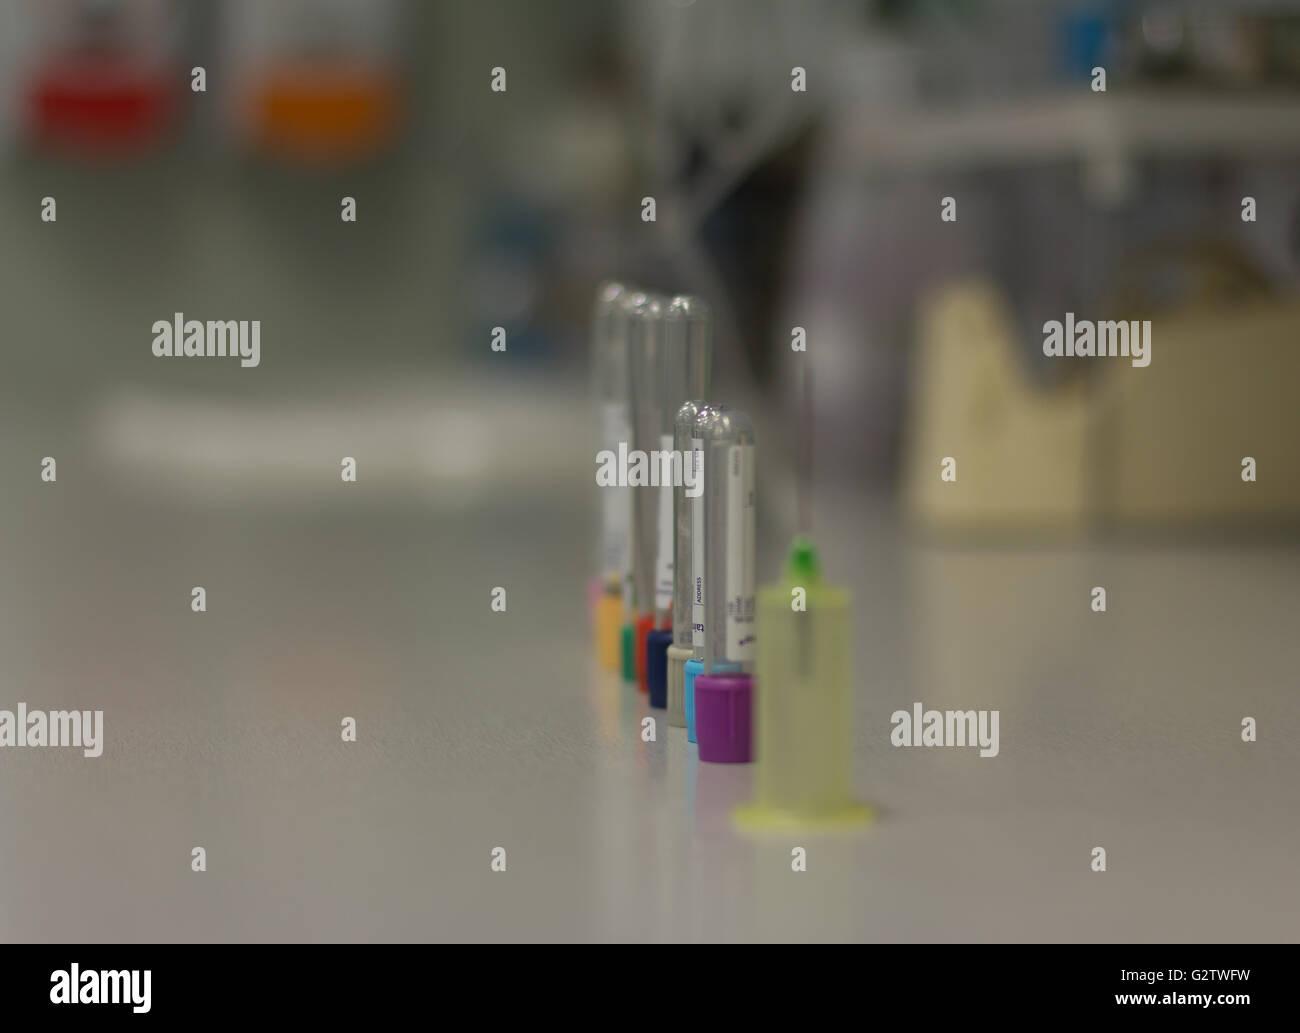 Blood vials, tests, Pathology - Stock Image